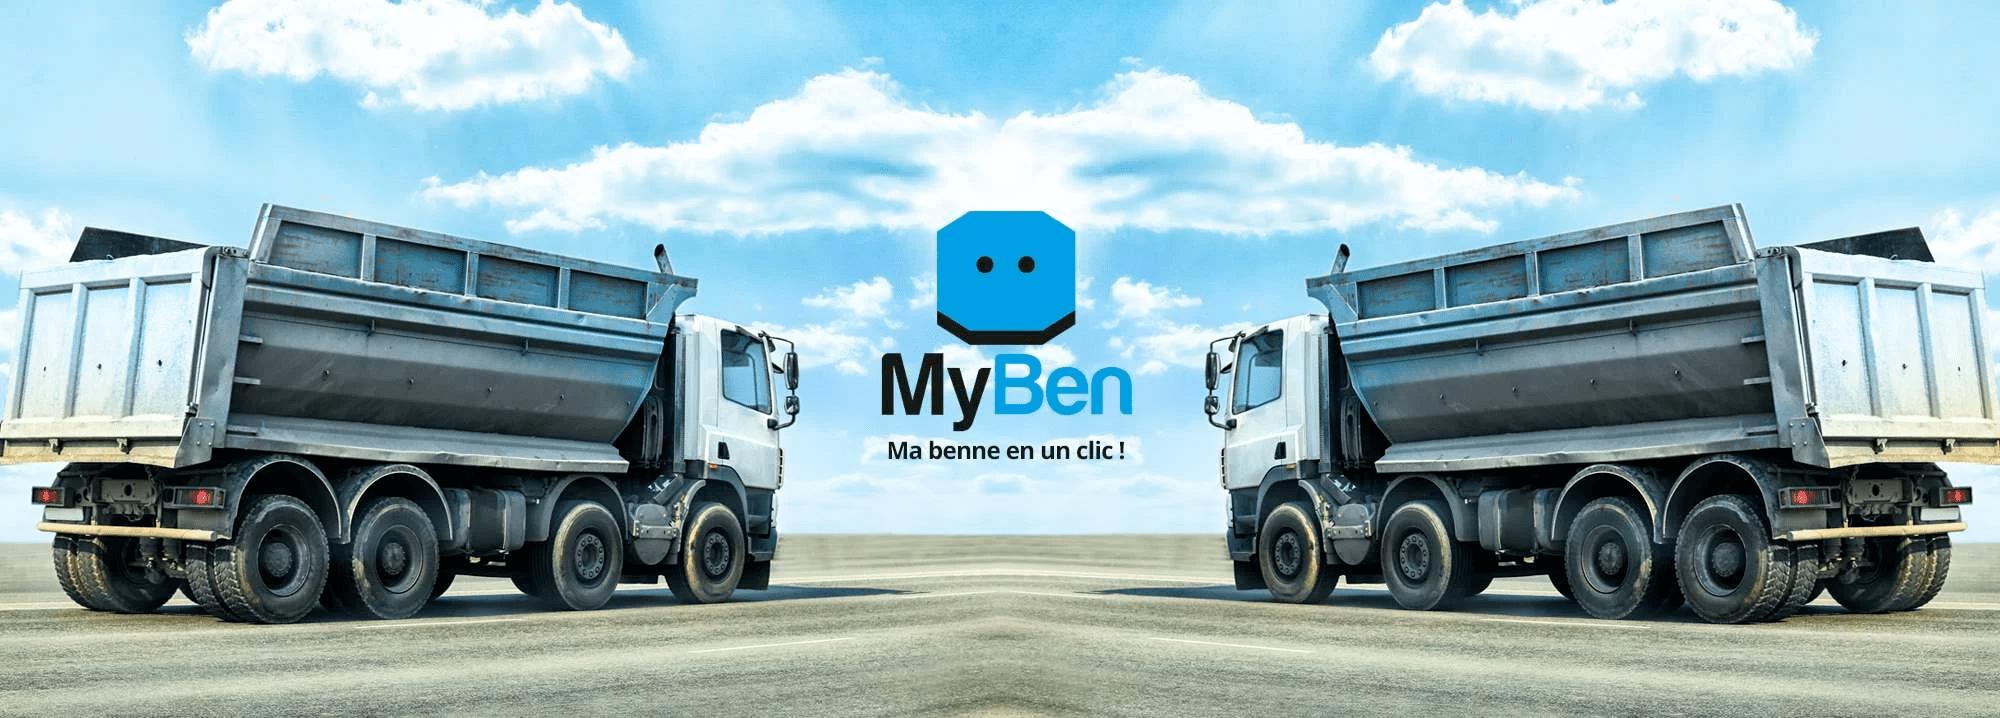 outils-tracabilite-dechets-chantier-myben